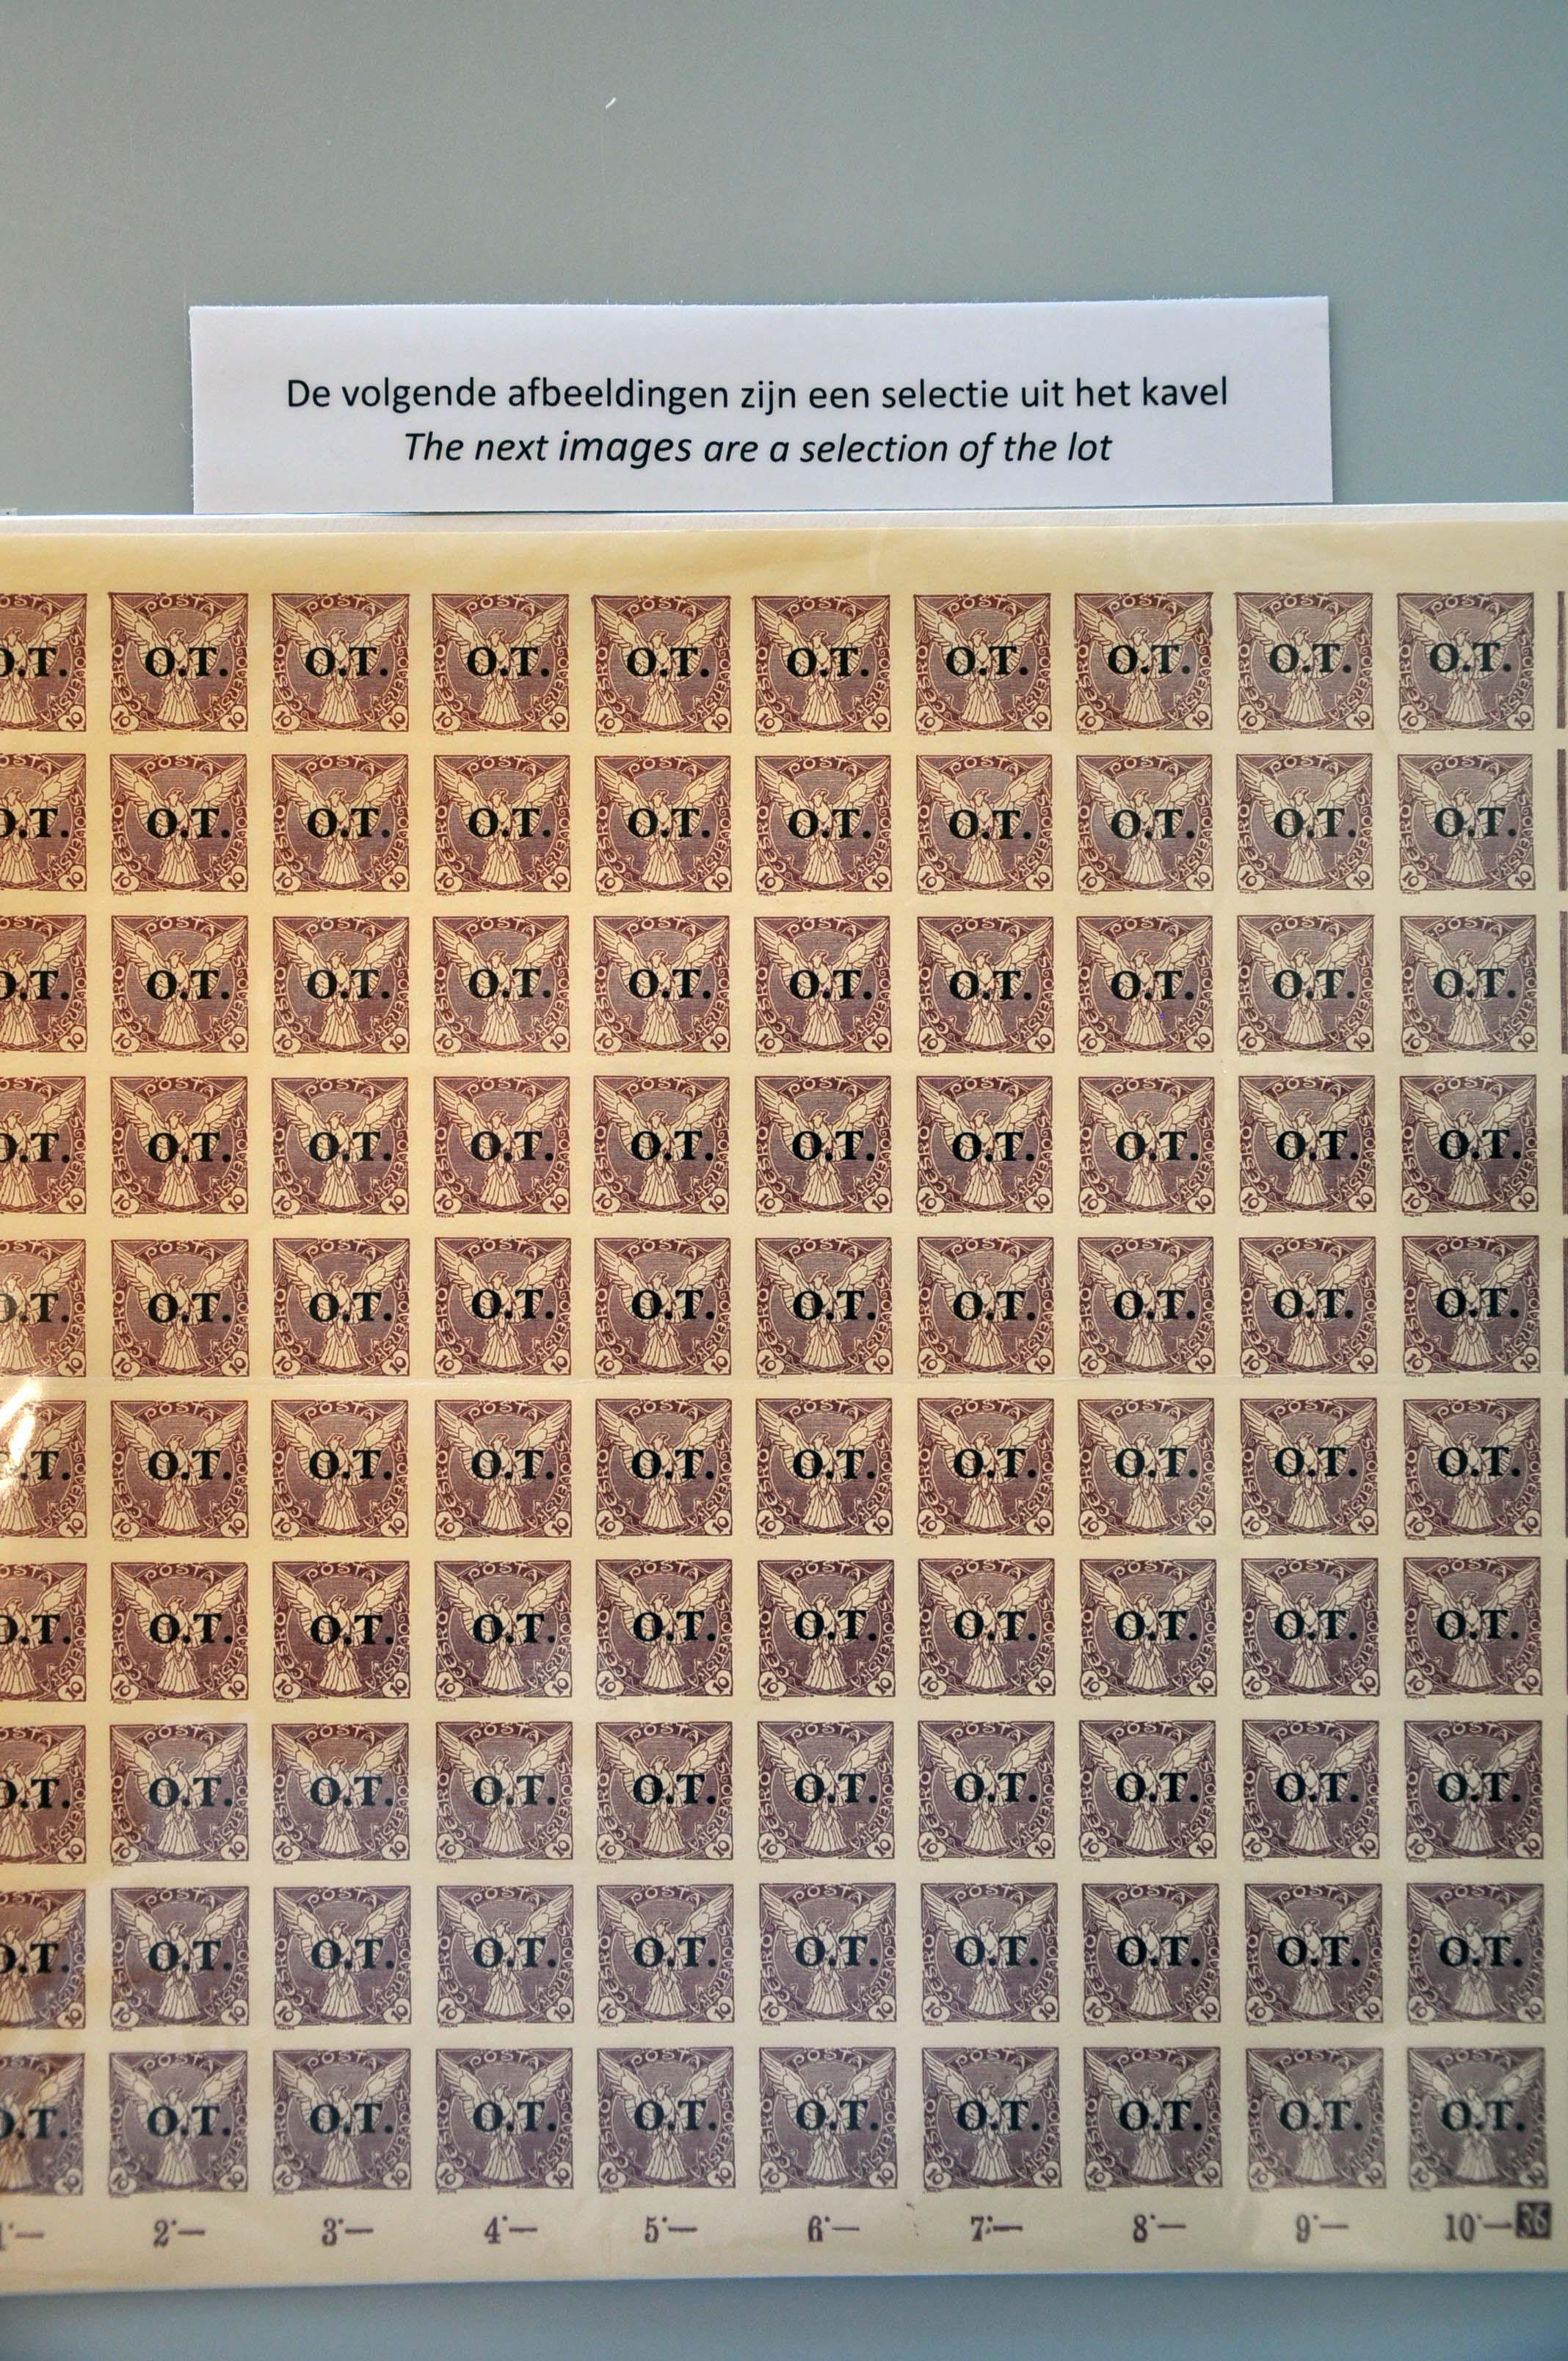 Lot 600 - European Countries Czechoslovakia -  Corinphila Veilingen Auction 245-246 Day 2 - Foreign countries - Collections and lots, Foreign countries - Boxes and literature